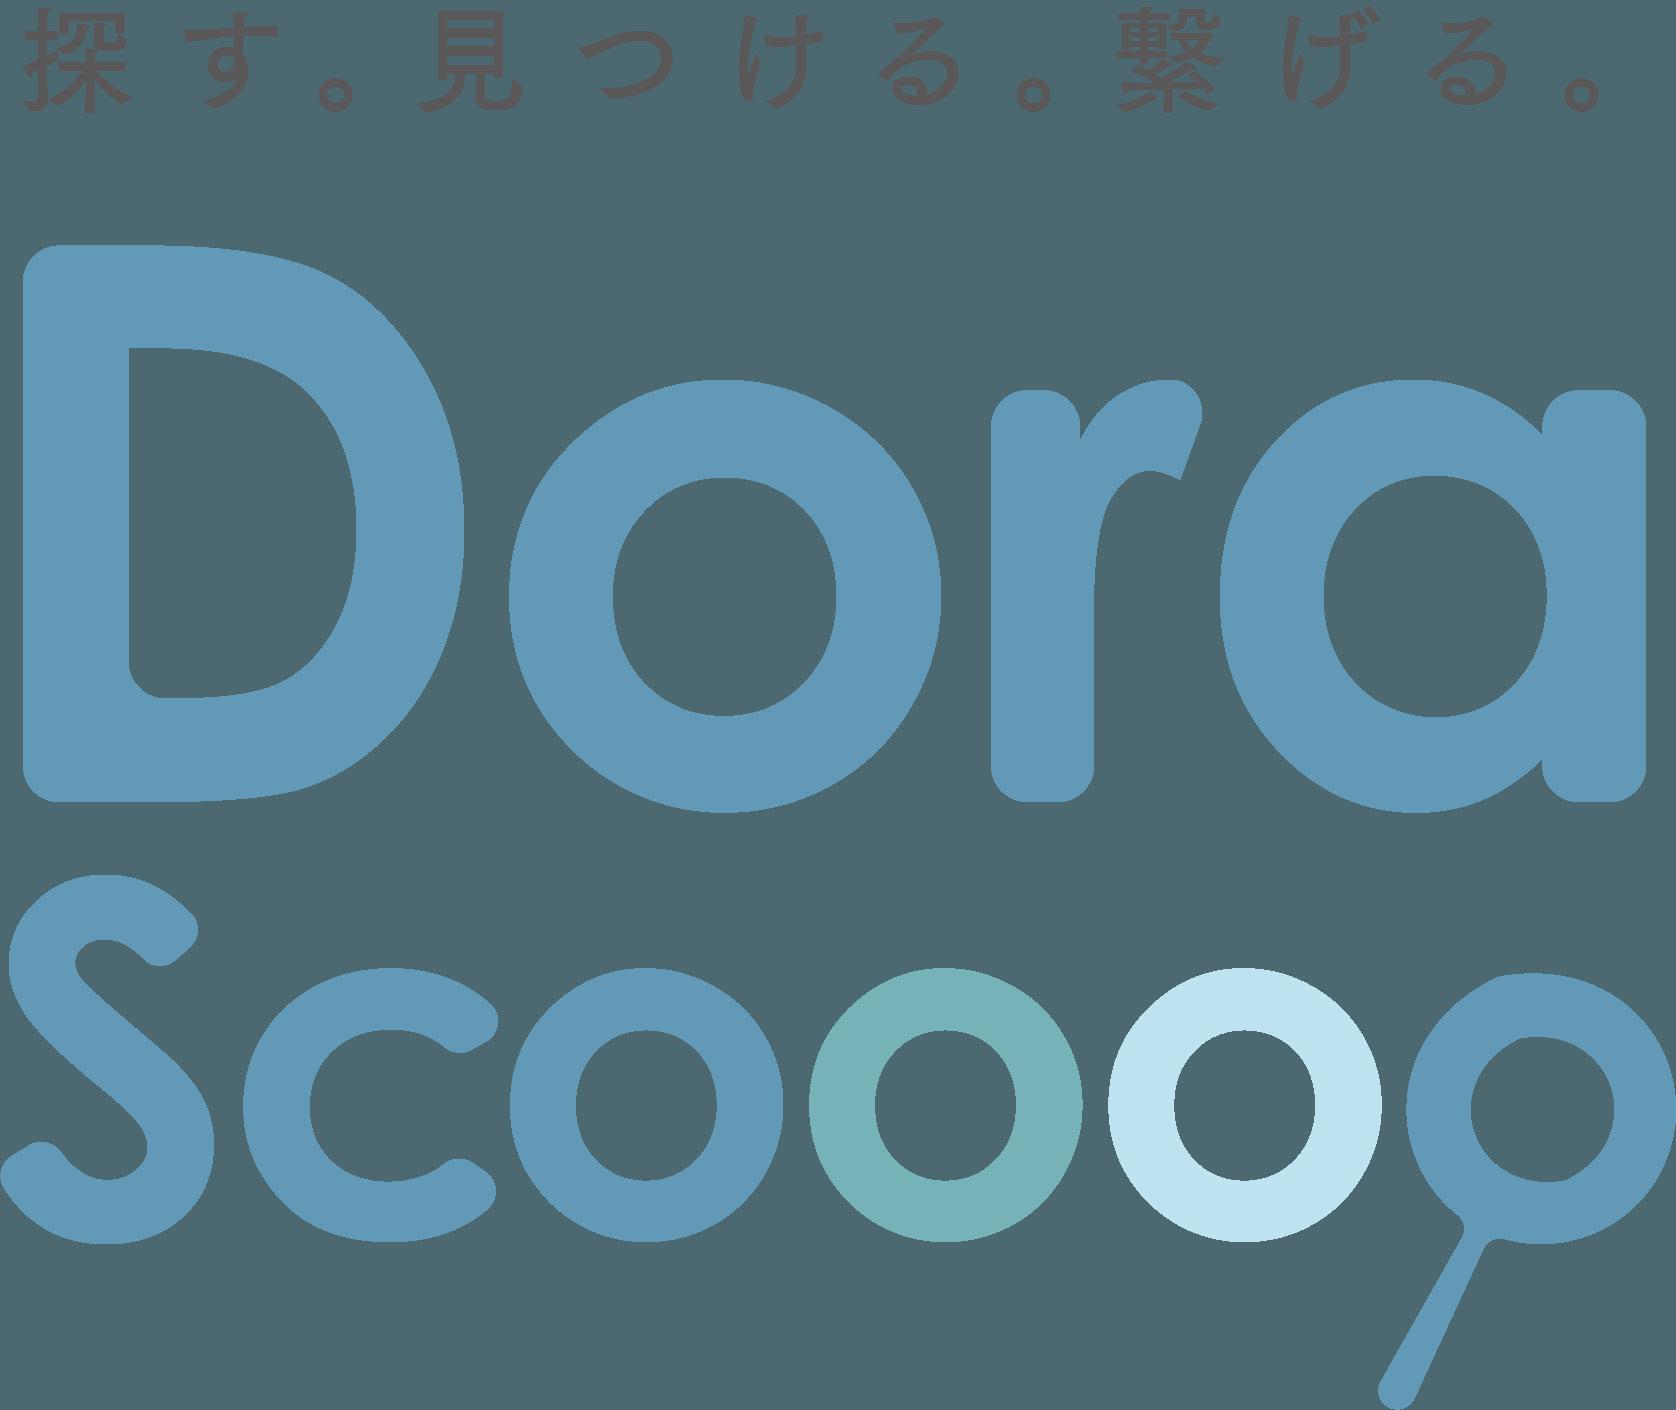 dorascooop_rogo